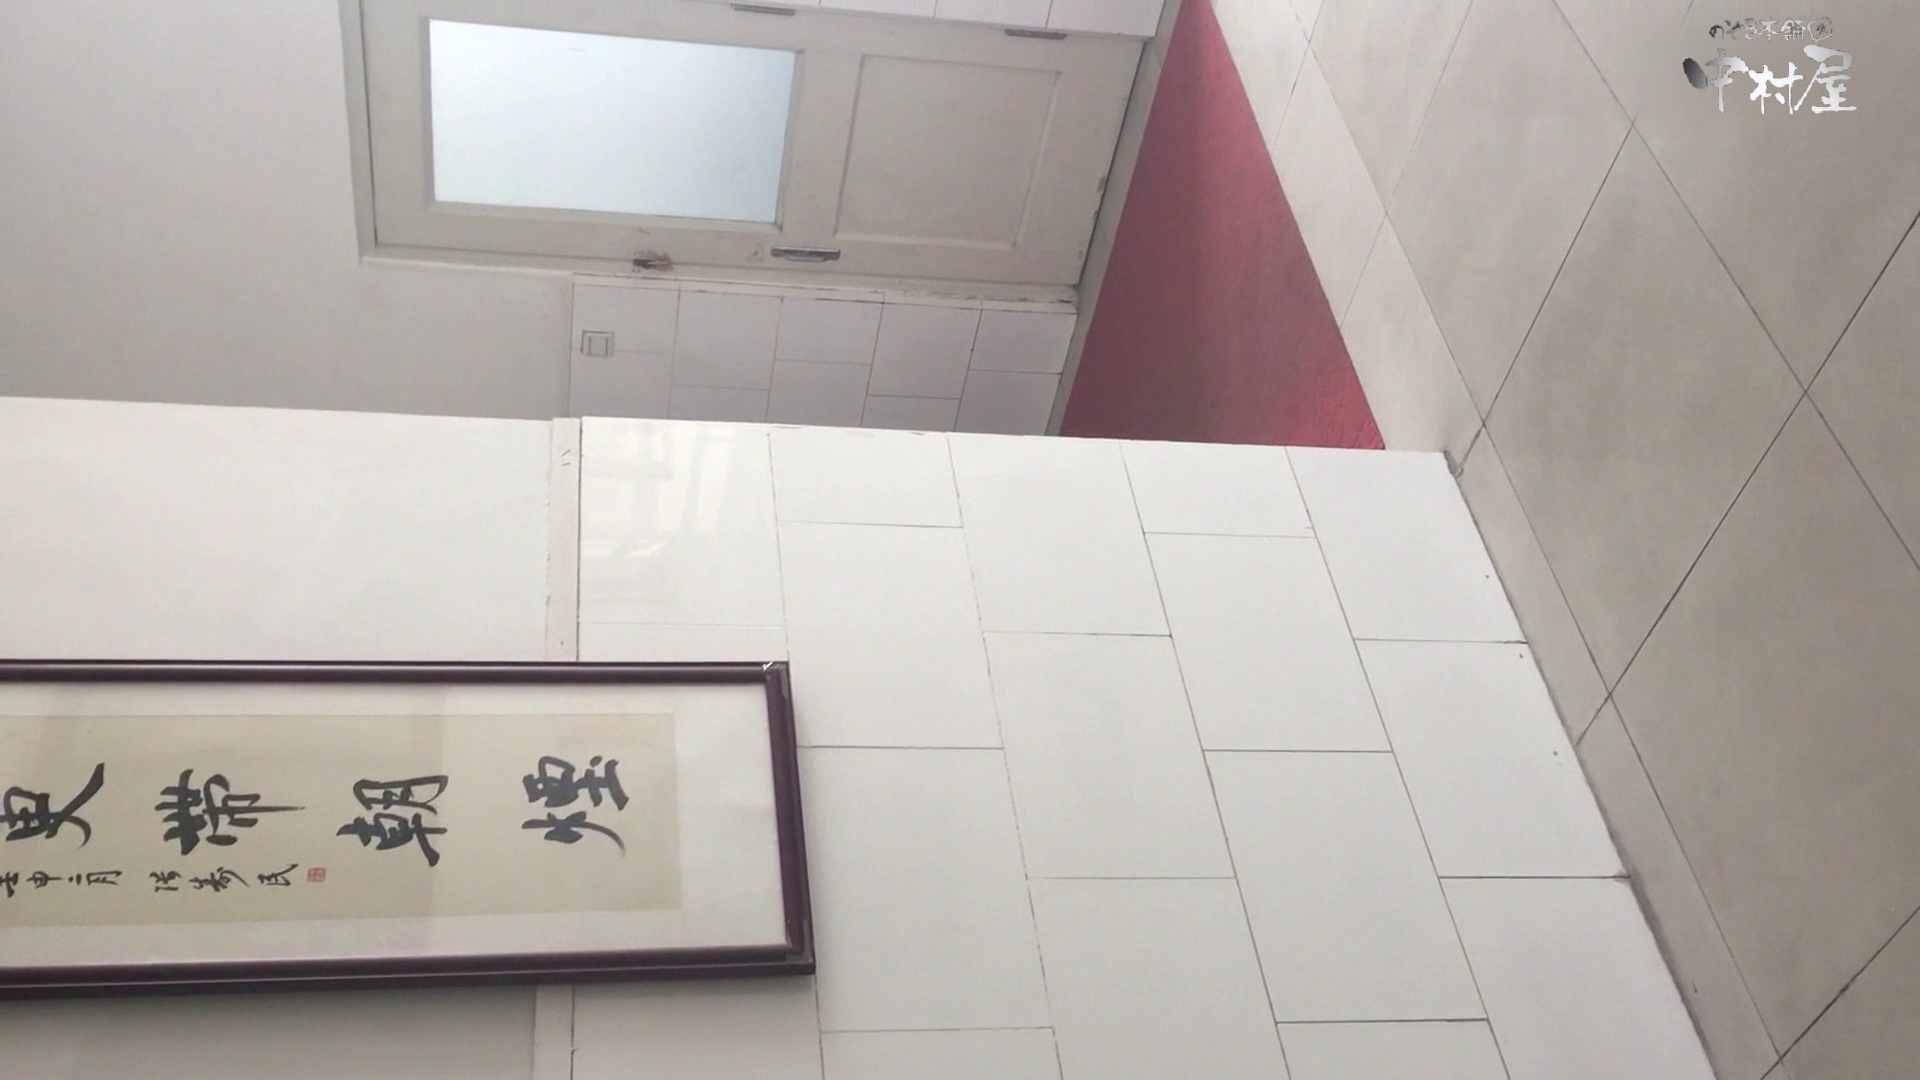 GOD HAND 芸術大学盗撮‼vol.94 エッチな盗撮 えろ無修正画像 97pic 45